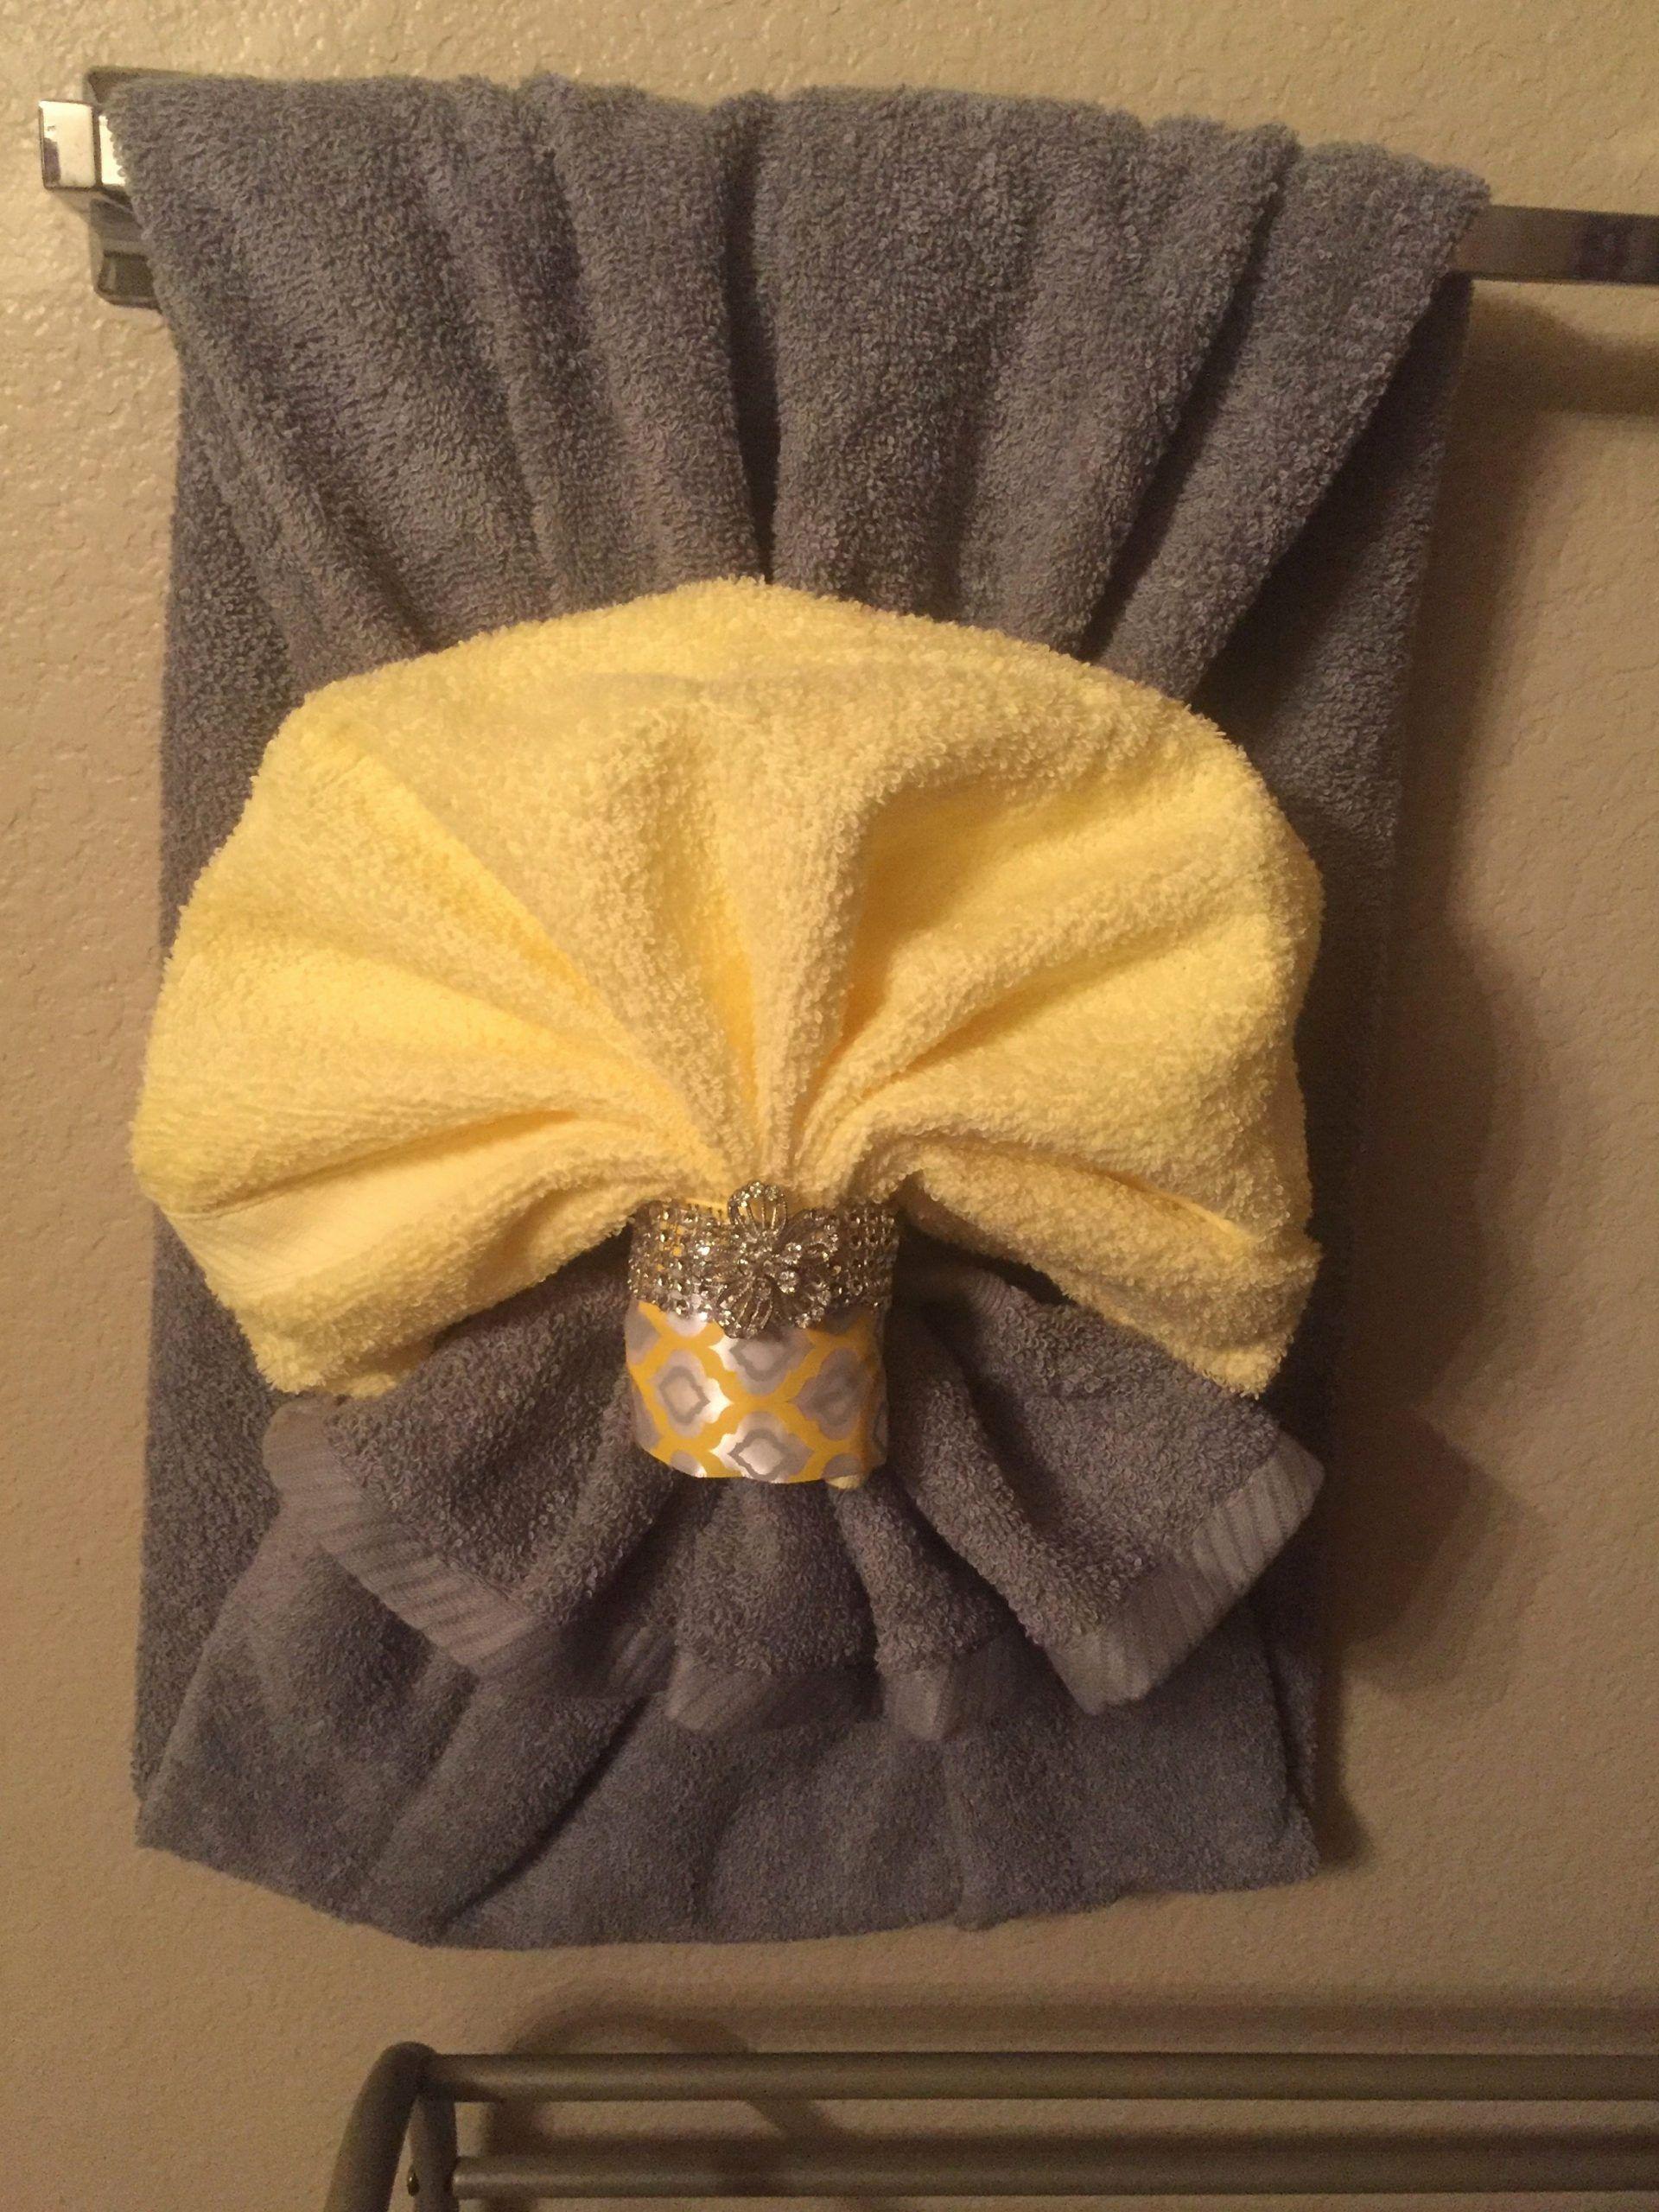 Bathroom Towel Decorating Ideas Best Of Towel Deco Decorating Ideas In 2020 Bathroom Towel Decor Decorative Towels Bathroom Towels